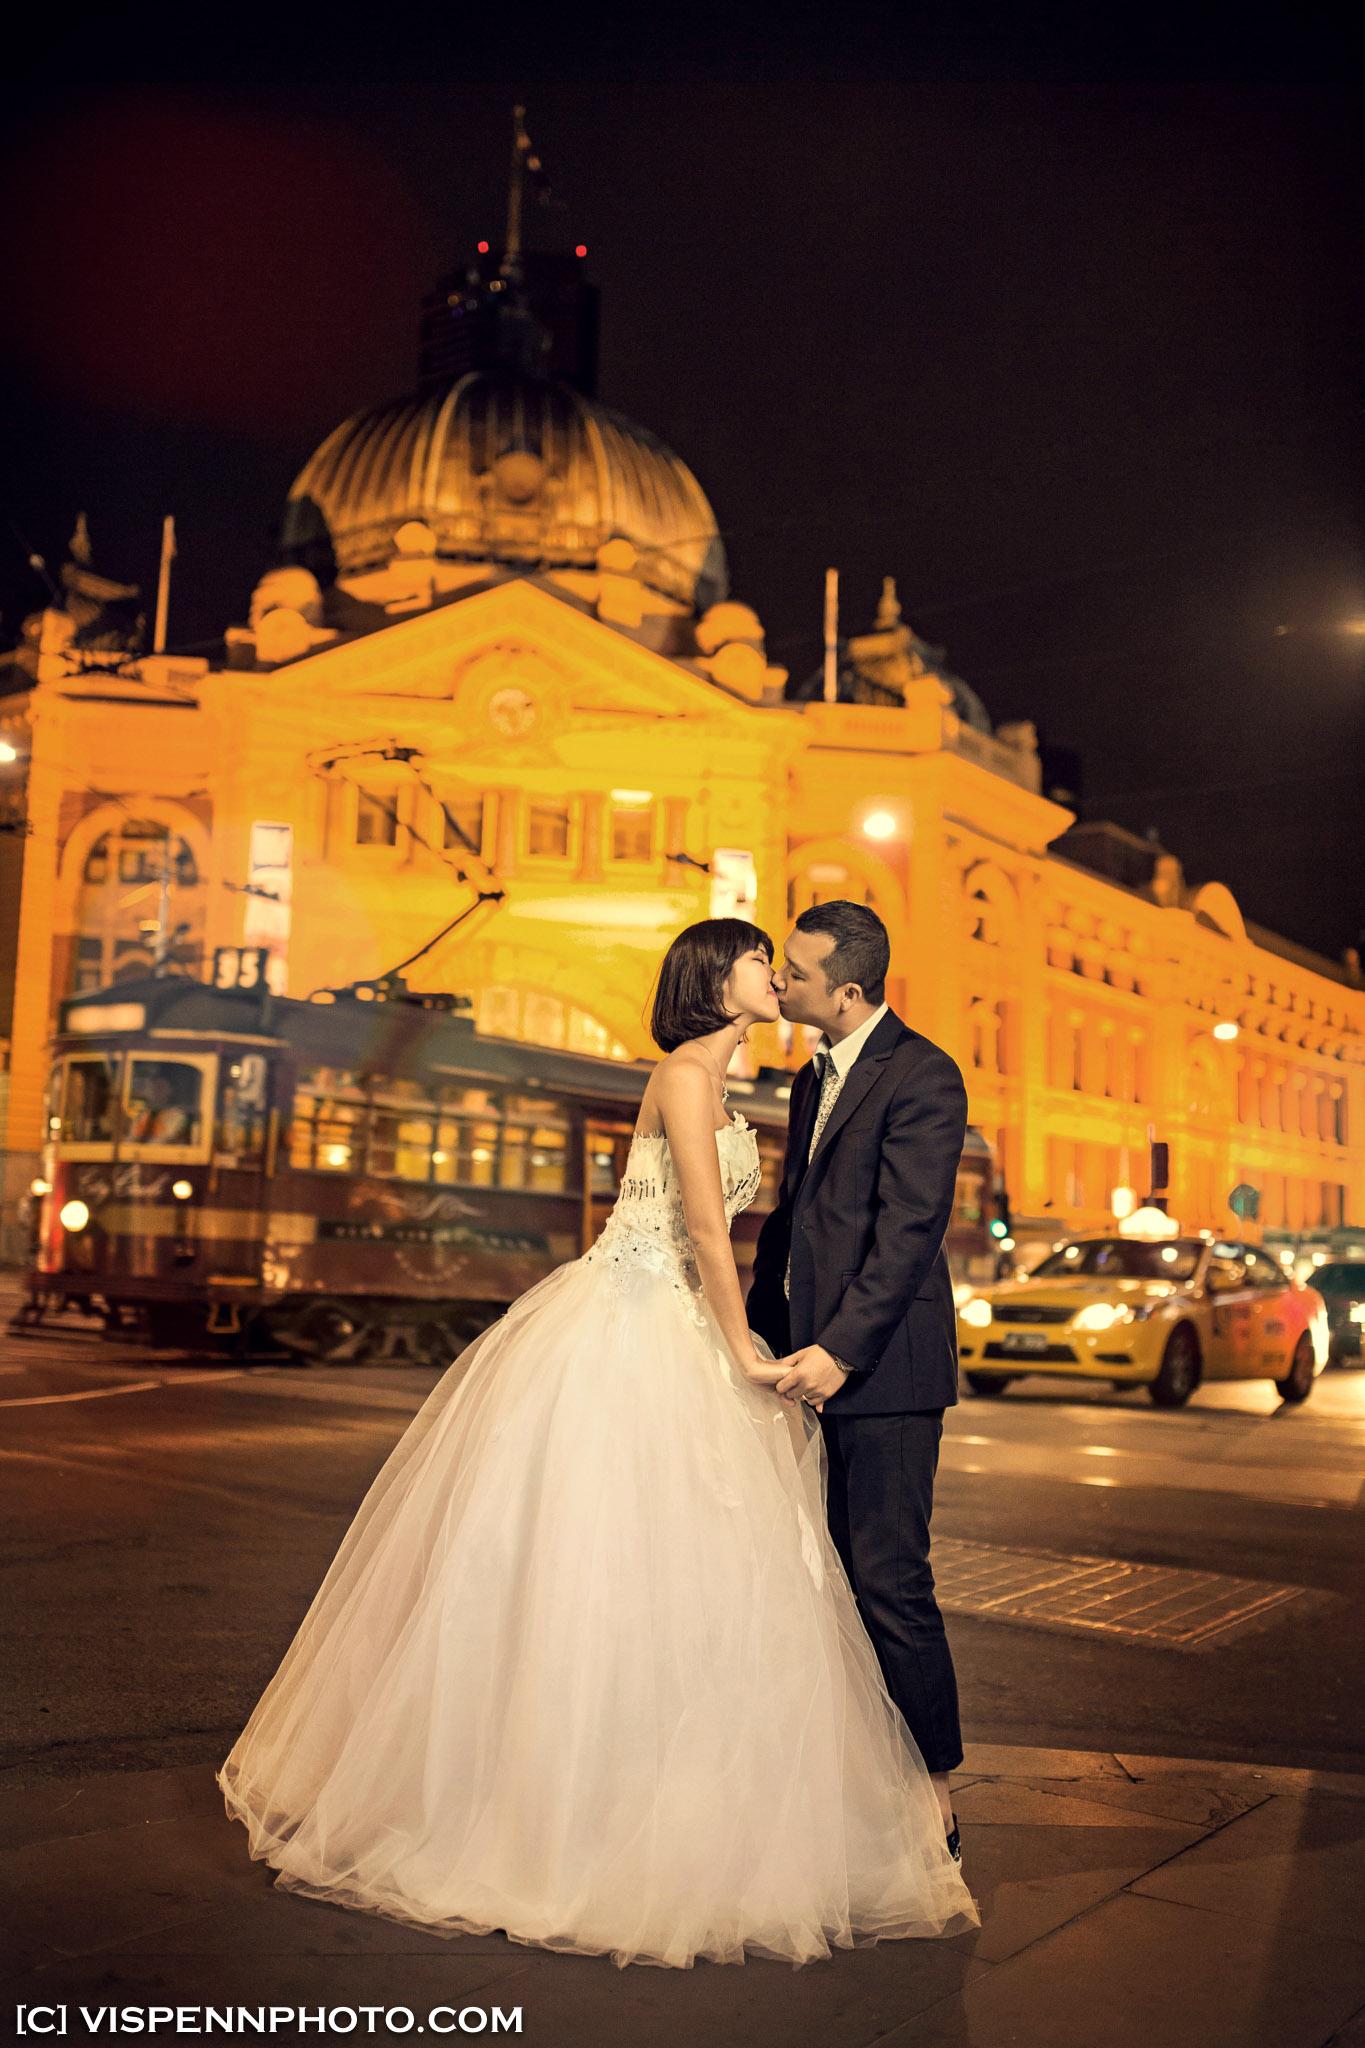 PRE WEDDING Photography Melbourne VISPENN 墨尔本 婚纱照 结婚照 婚纱摄影 5D3 7918